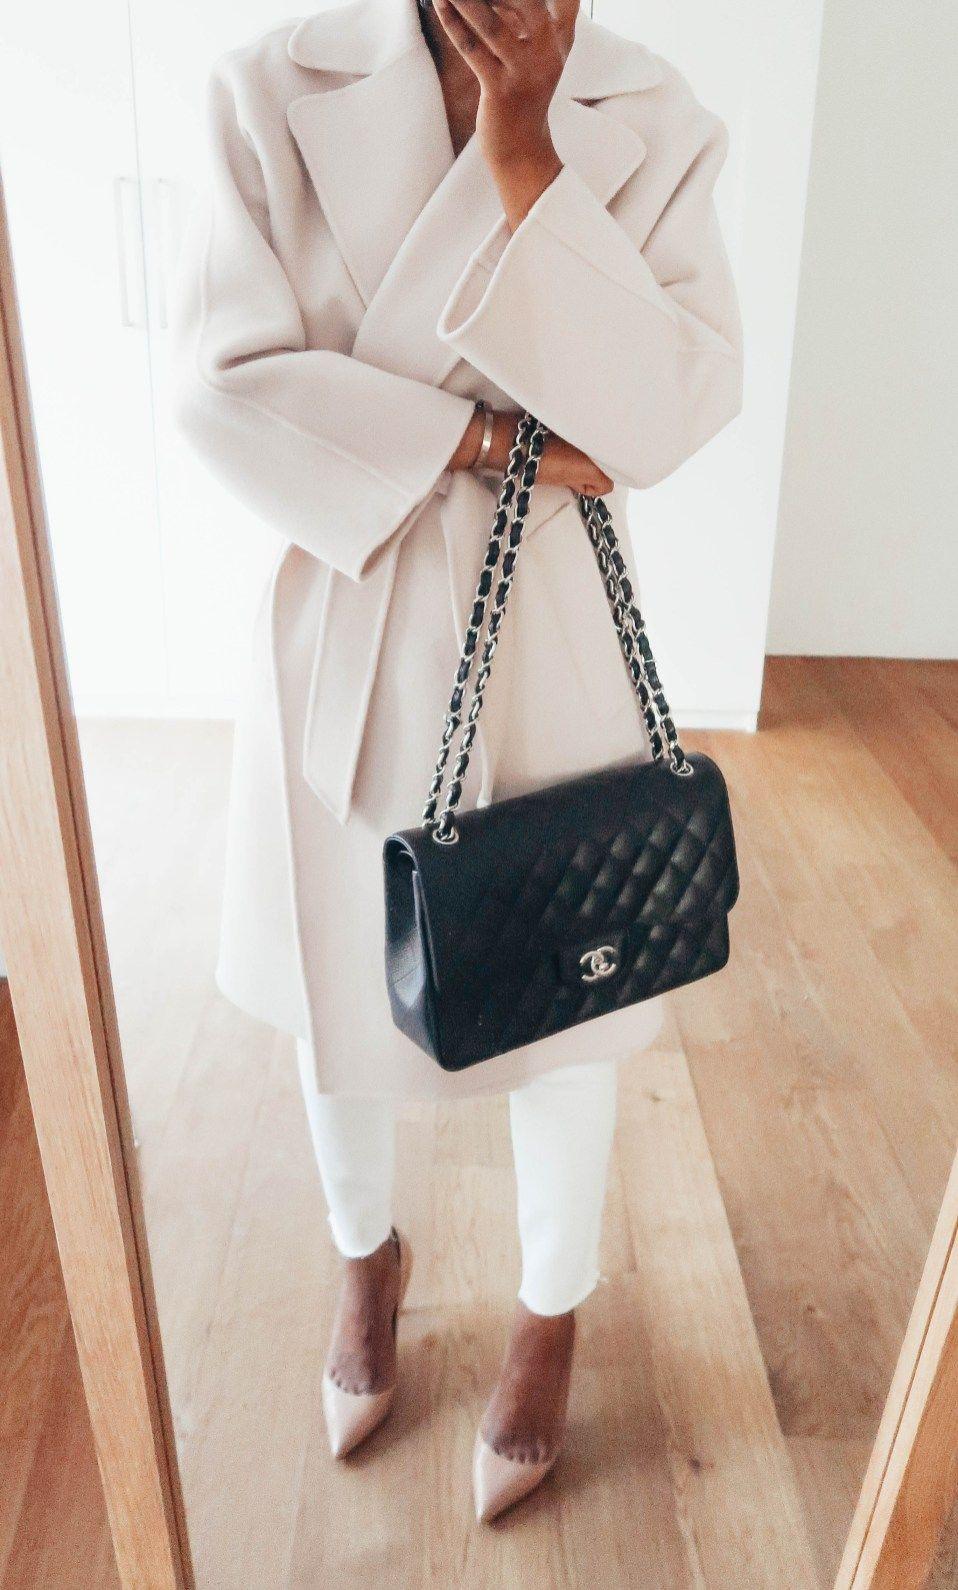 Chanel jumbo flap outfit. Classic coat. Elegant winter